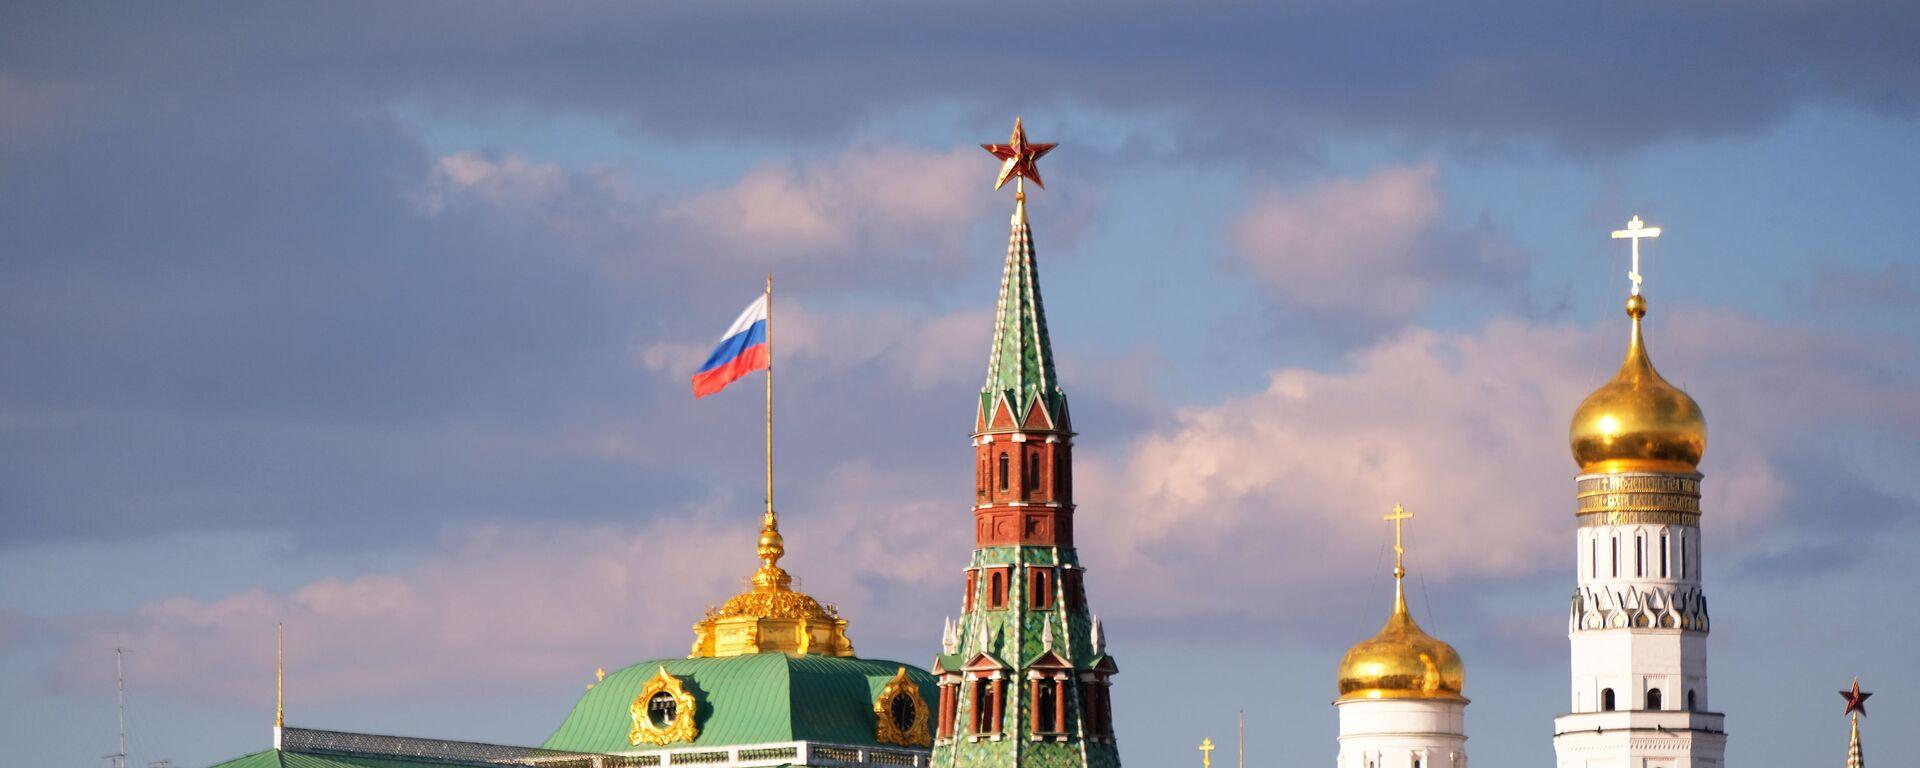 El Kremlin de Moscú - Sputnik Mundo, 1920, 04.06.2021